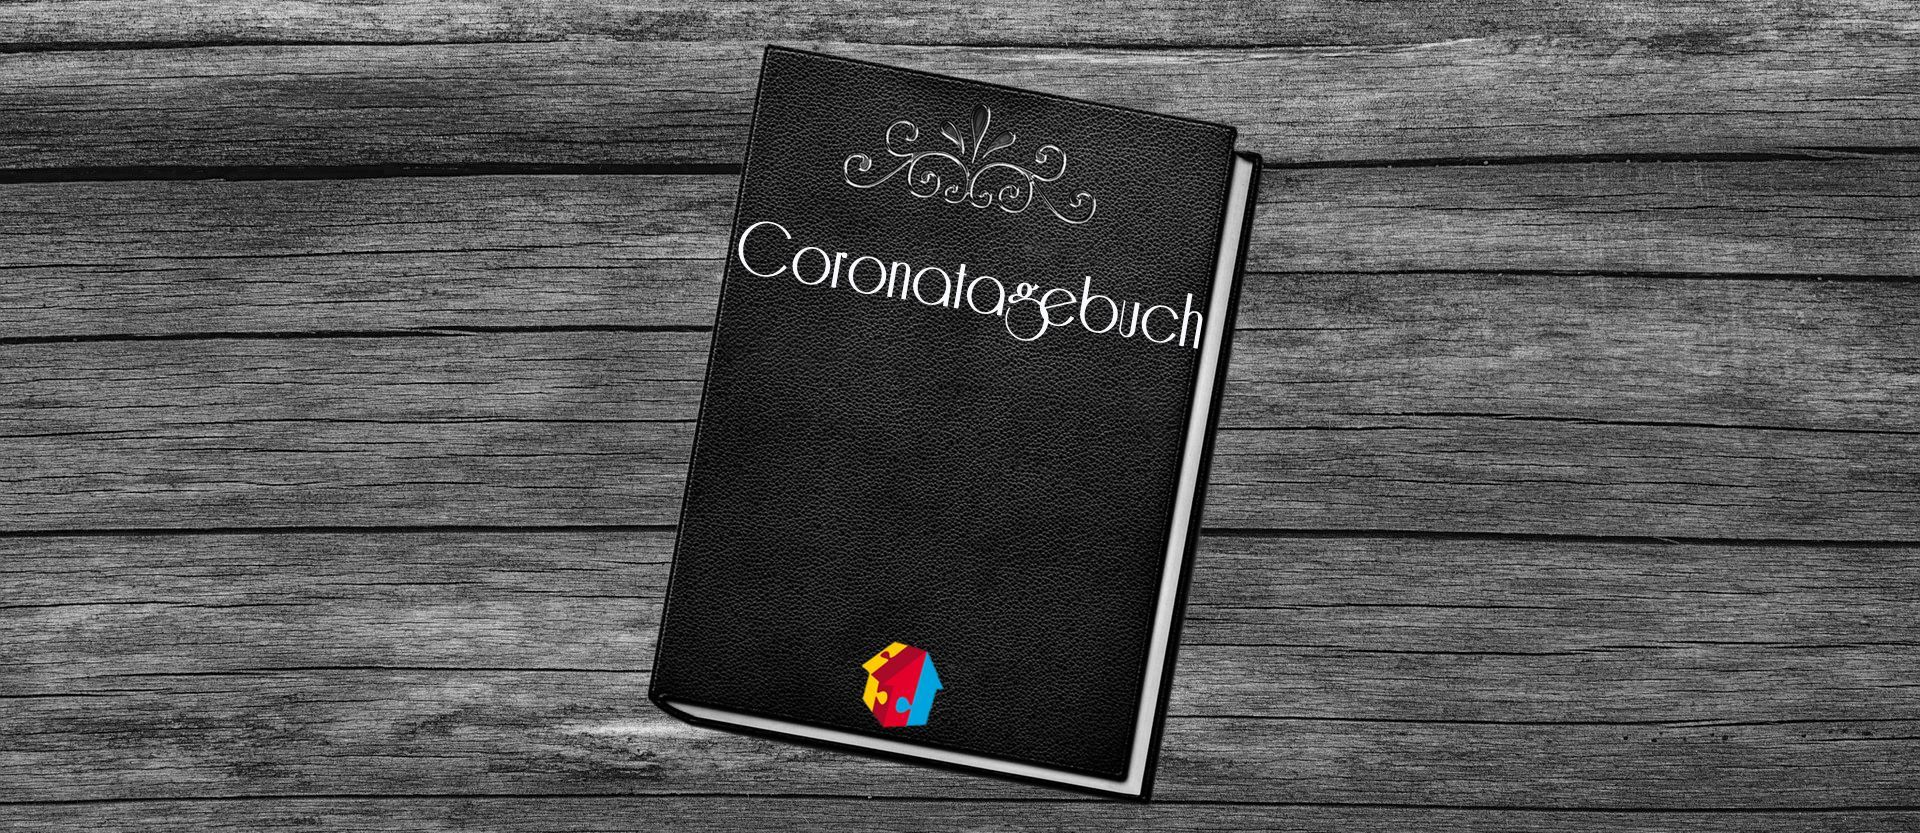 Memories To A Normal Life - Corona-Tagebuch